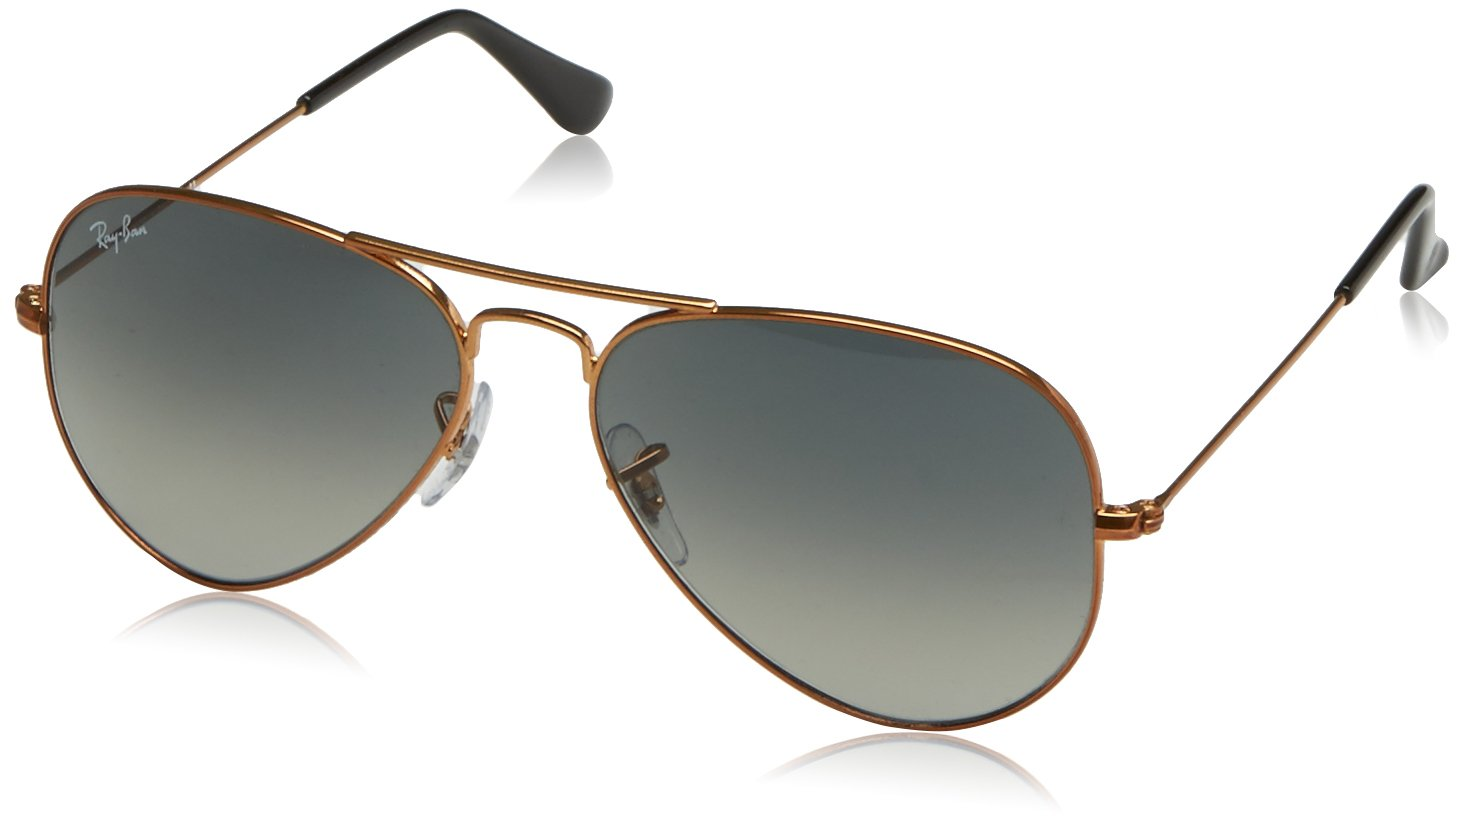 Ray-Ban Men's Large Metal Aviator Sunglasses, Shiny Bronze, 55 mm